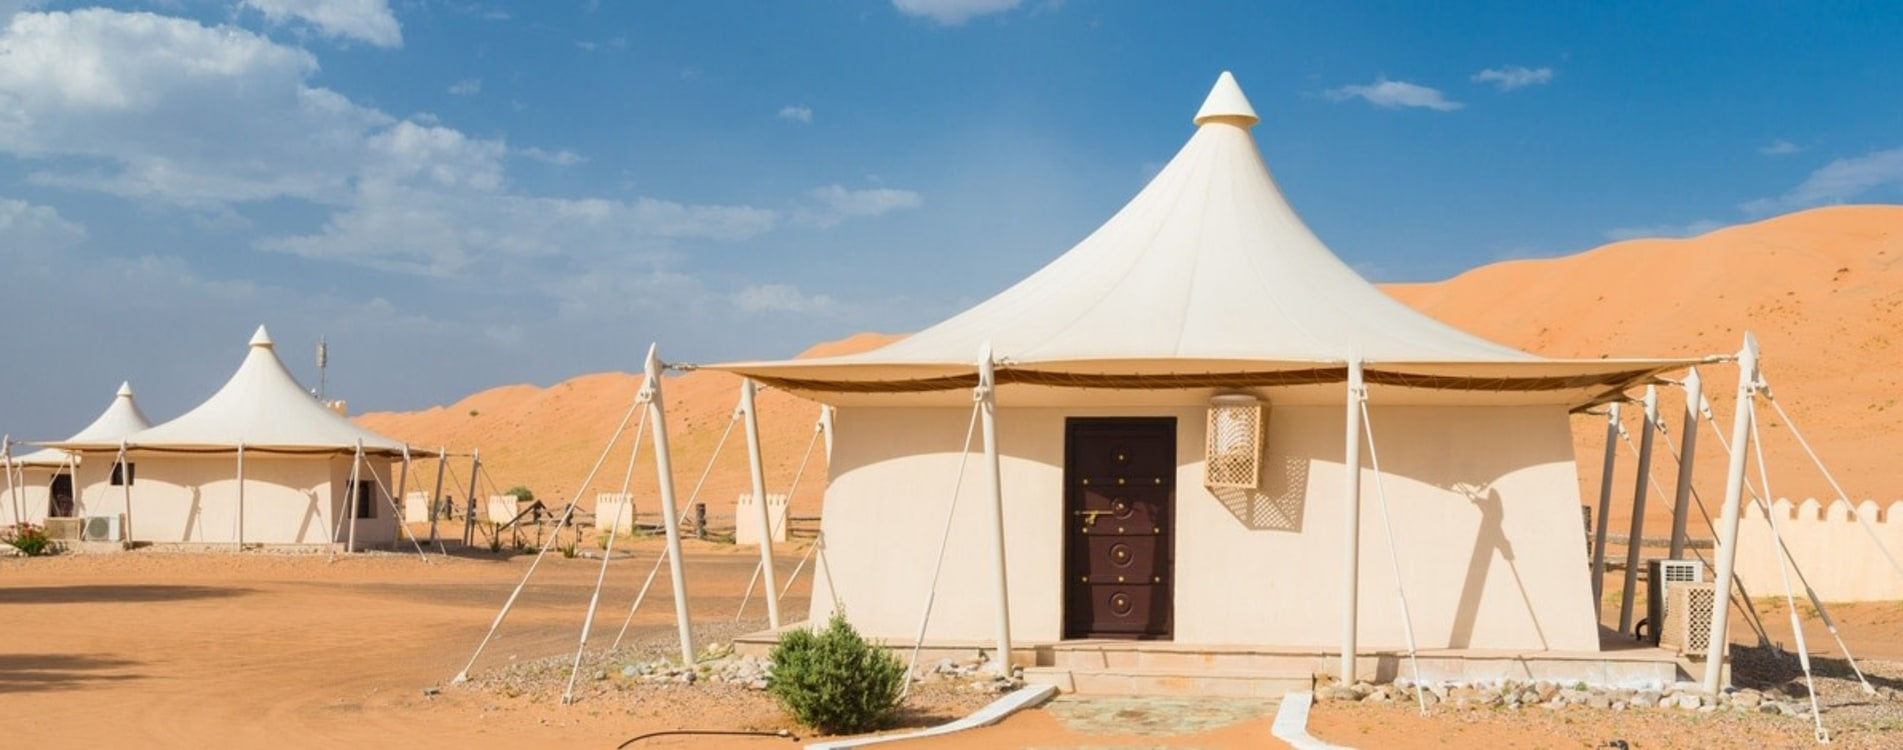 Desert-NIghts-Camp-Zelt-Exterior-Wüste-Oman.jpg